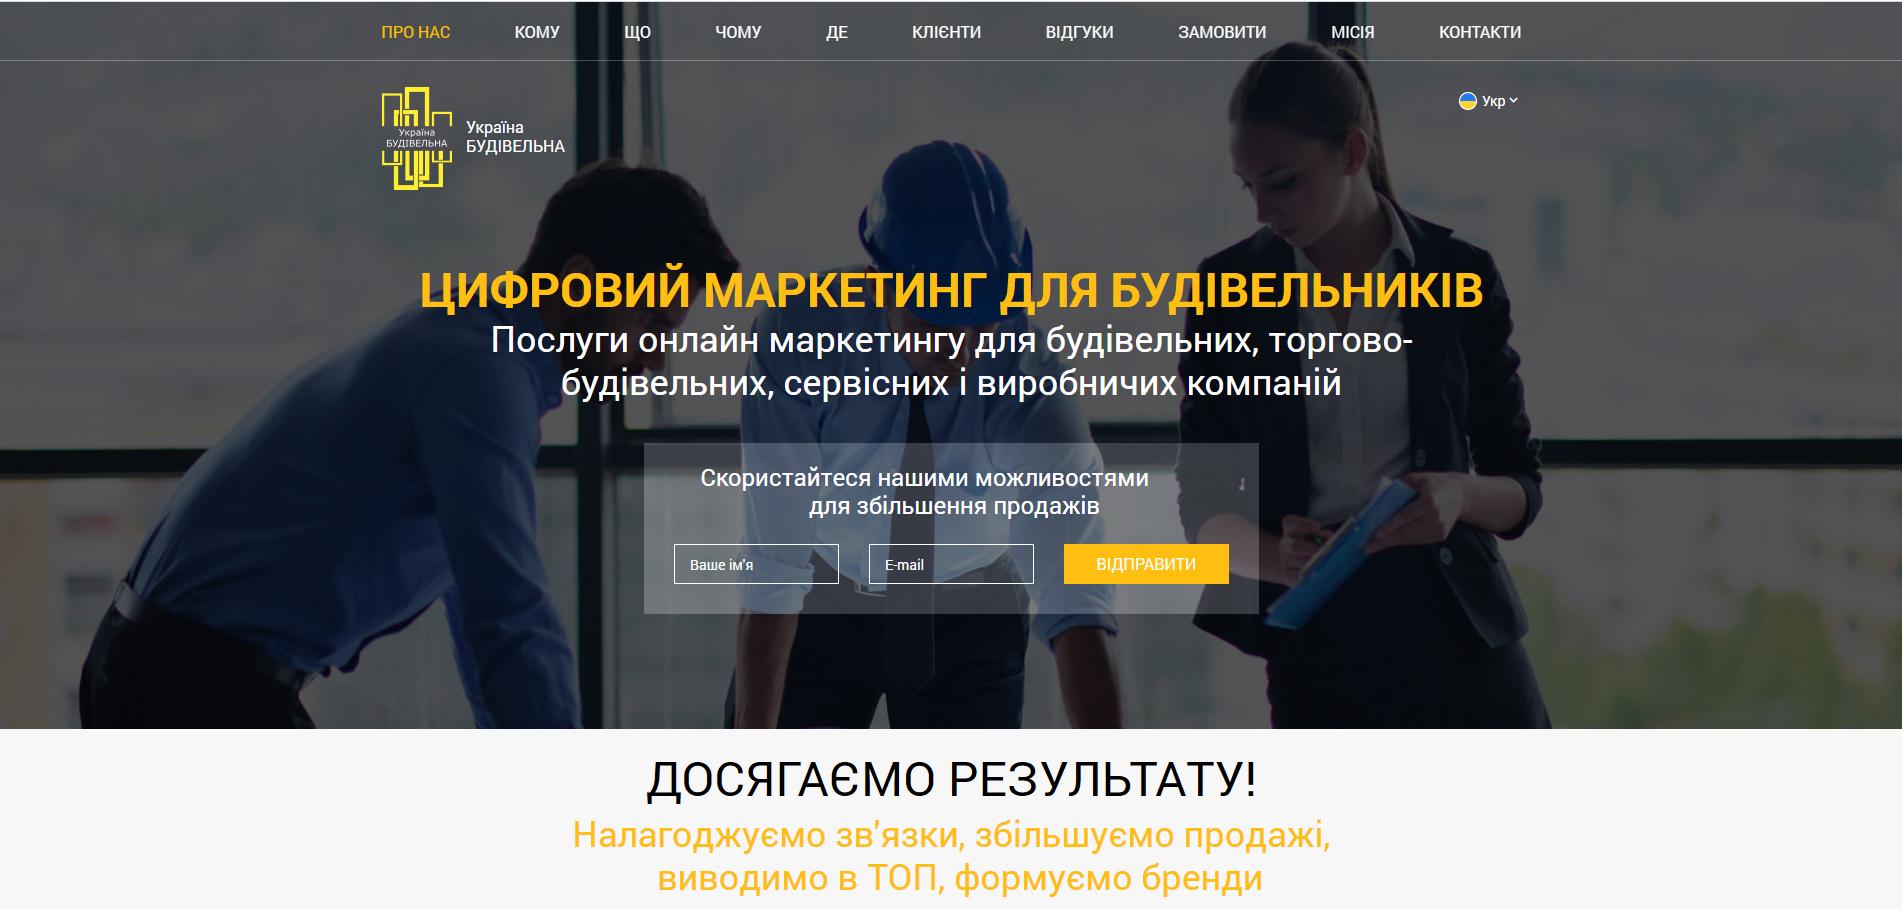 послуги онлайн маркетингу